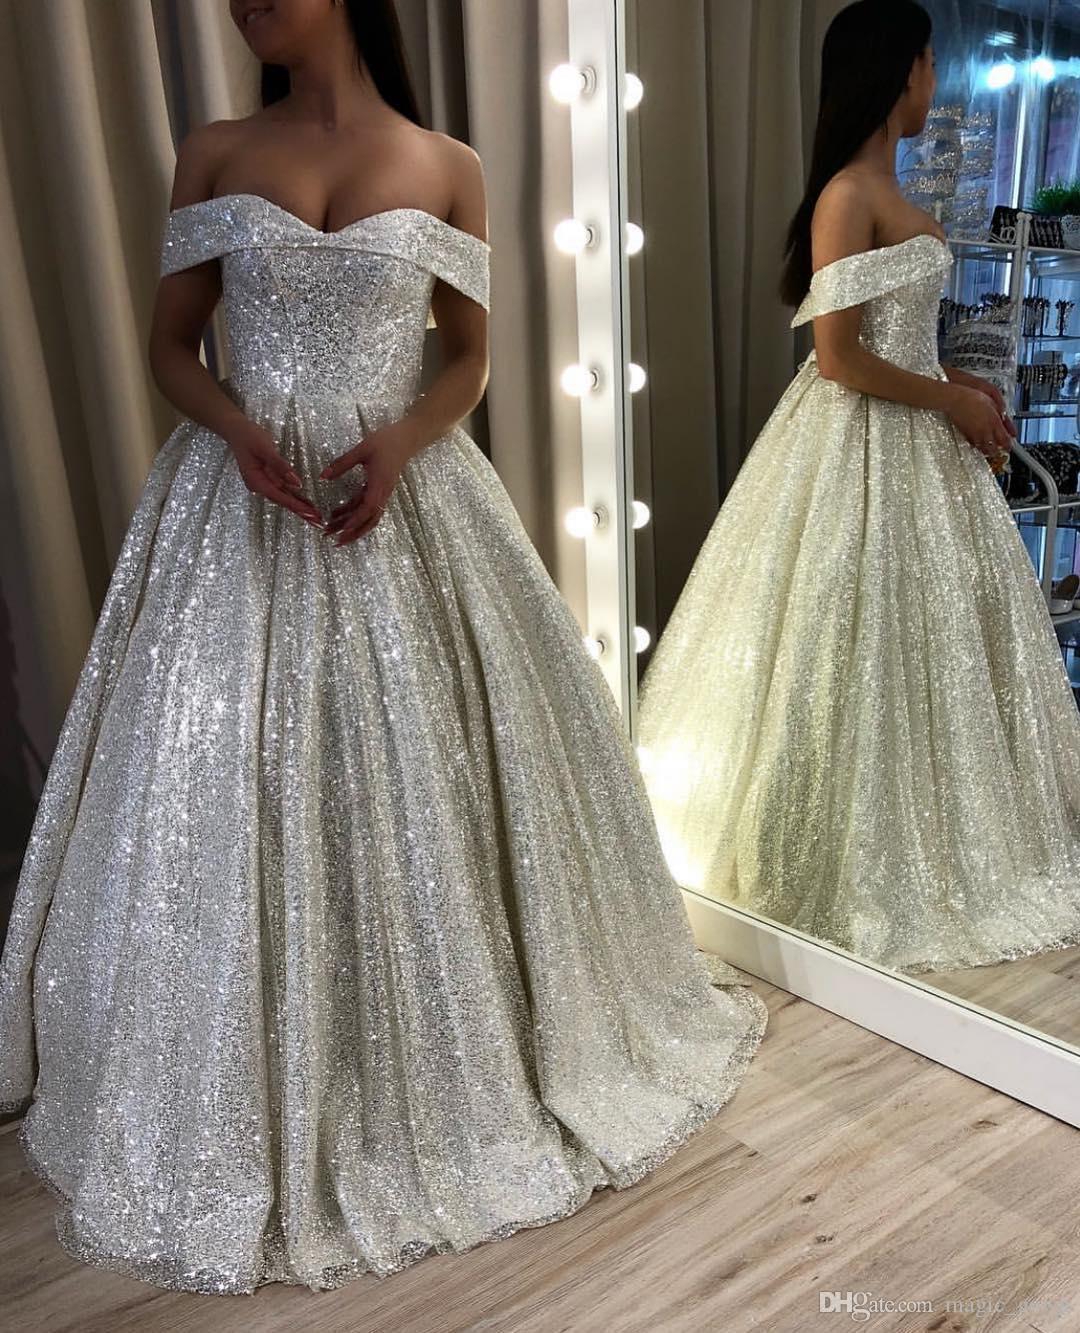 Sexy 2019 New Bling Bling Vestidos de Casamento Do Laço Applique Pregas Fora Do Ombro Até O Chão Vestido de Noiva Vestidos de Noiva Vestidos De Novia